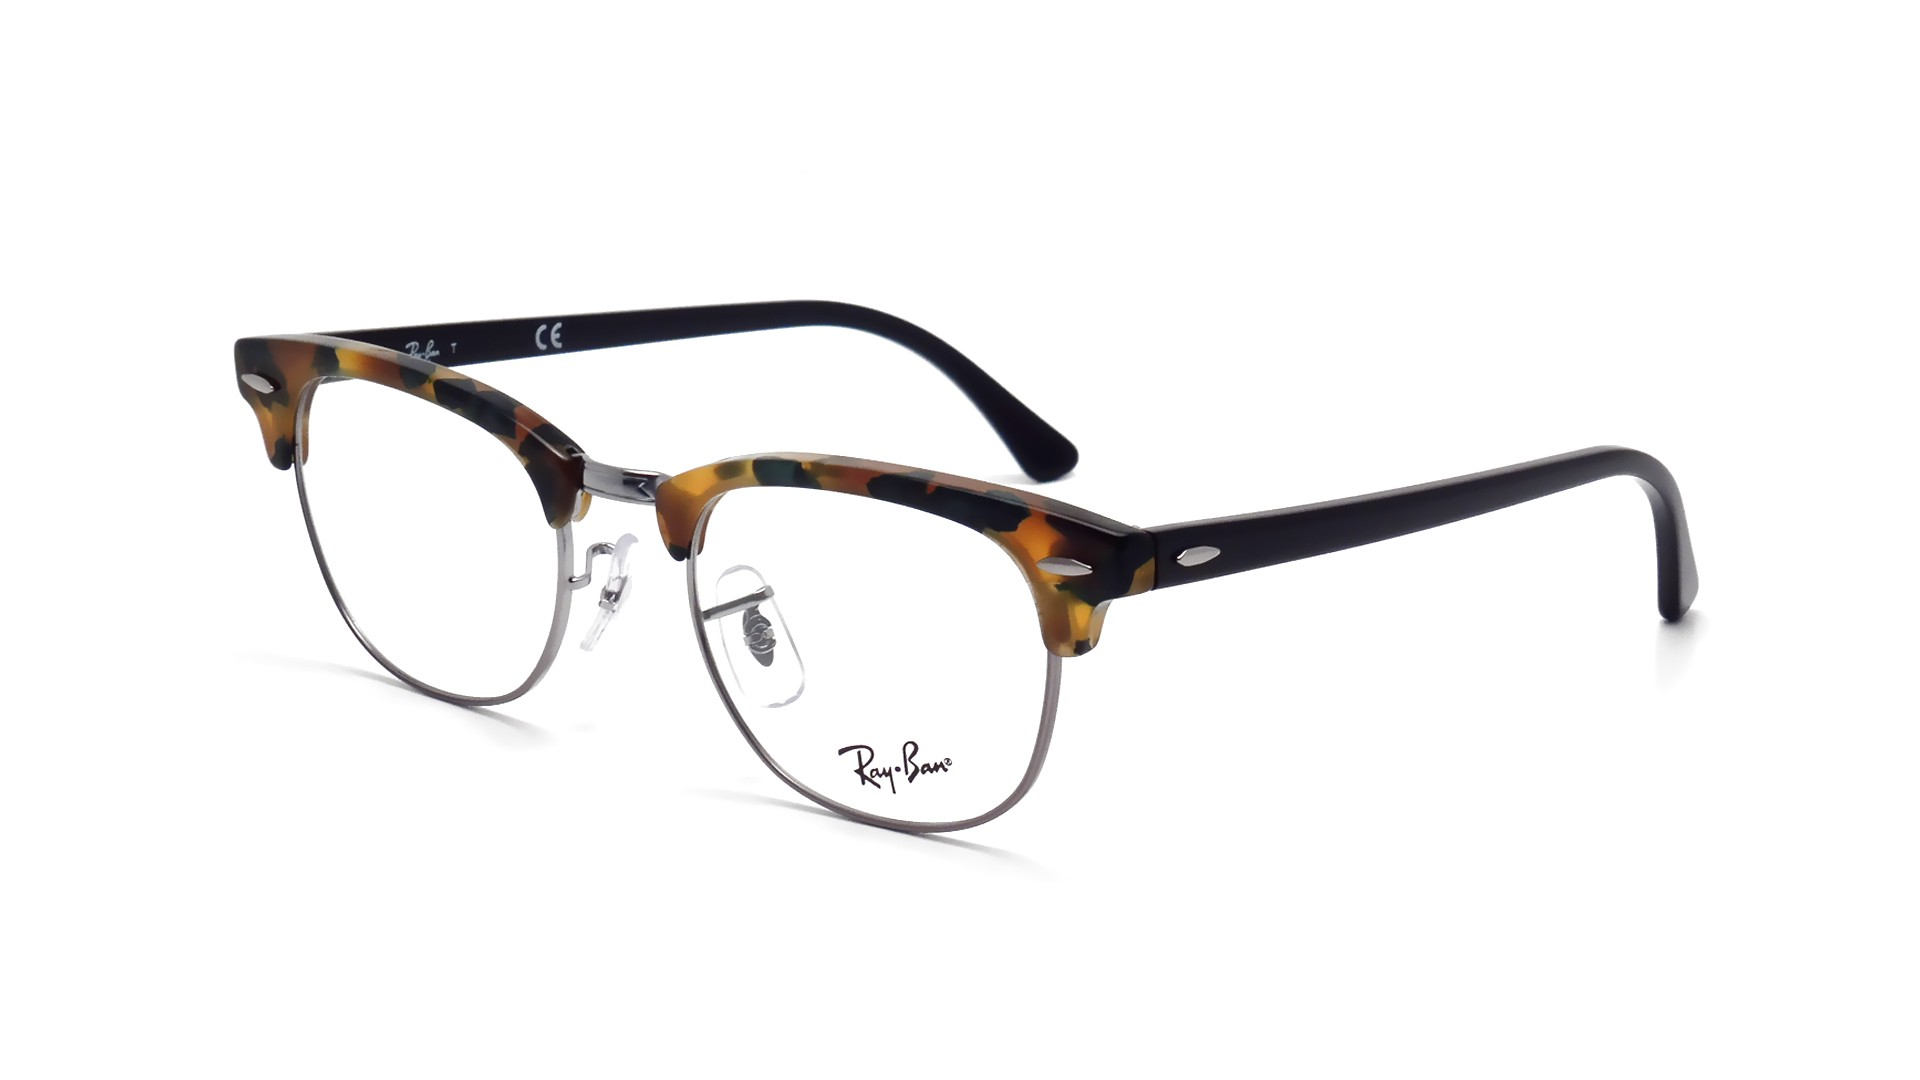 Rb5154 Clubmaster Eyeglasses Price www.tapdance.org